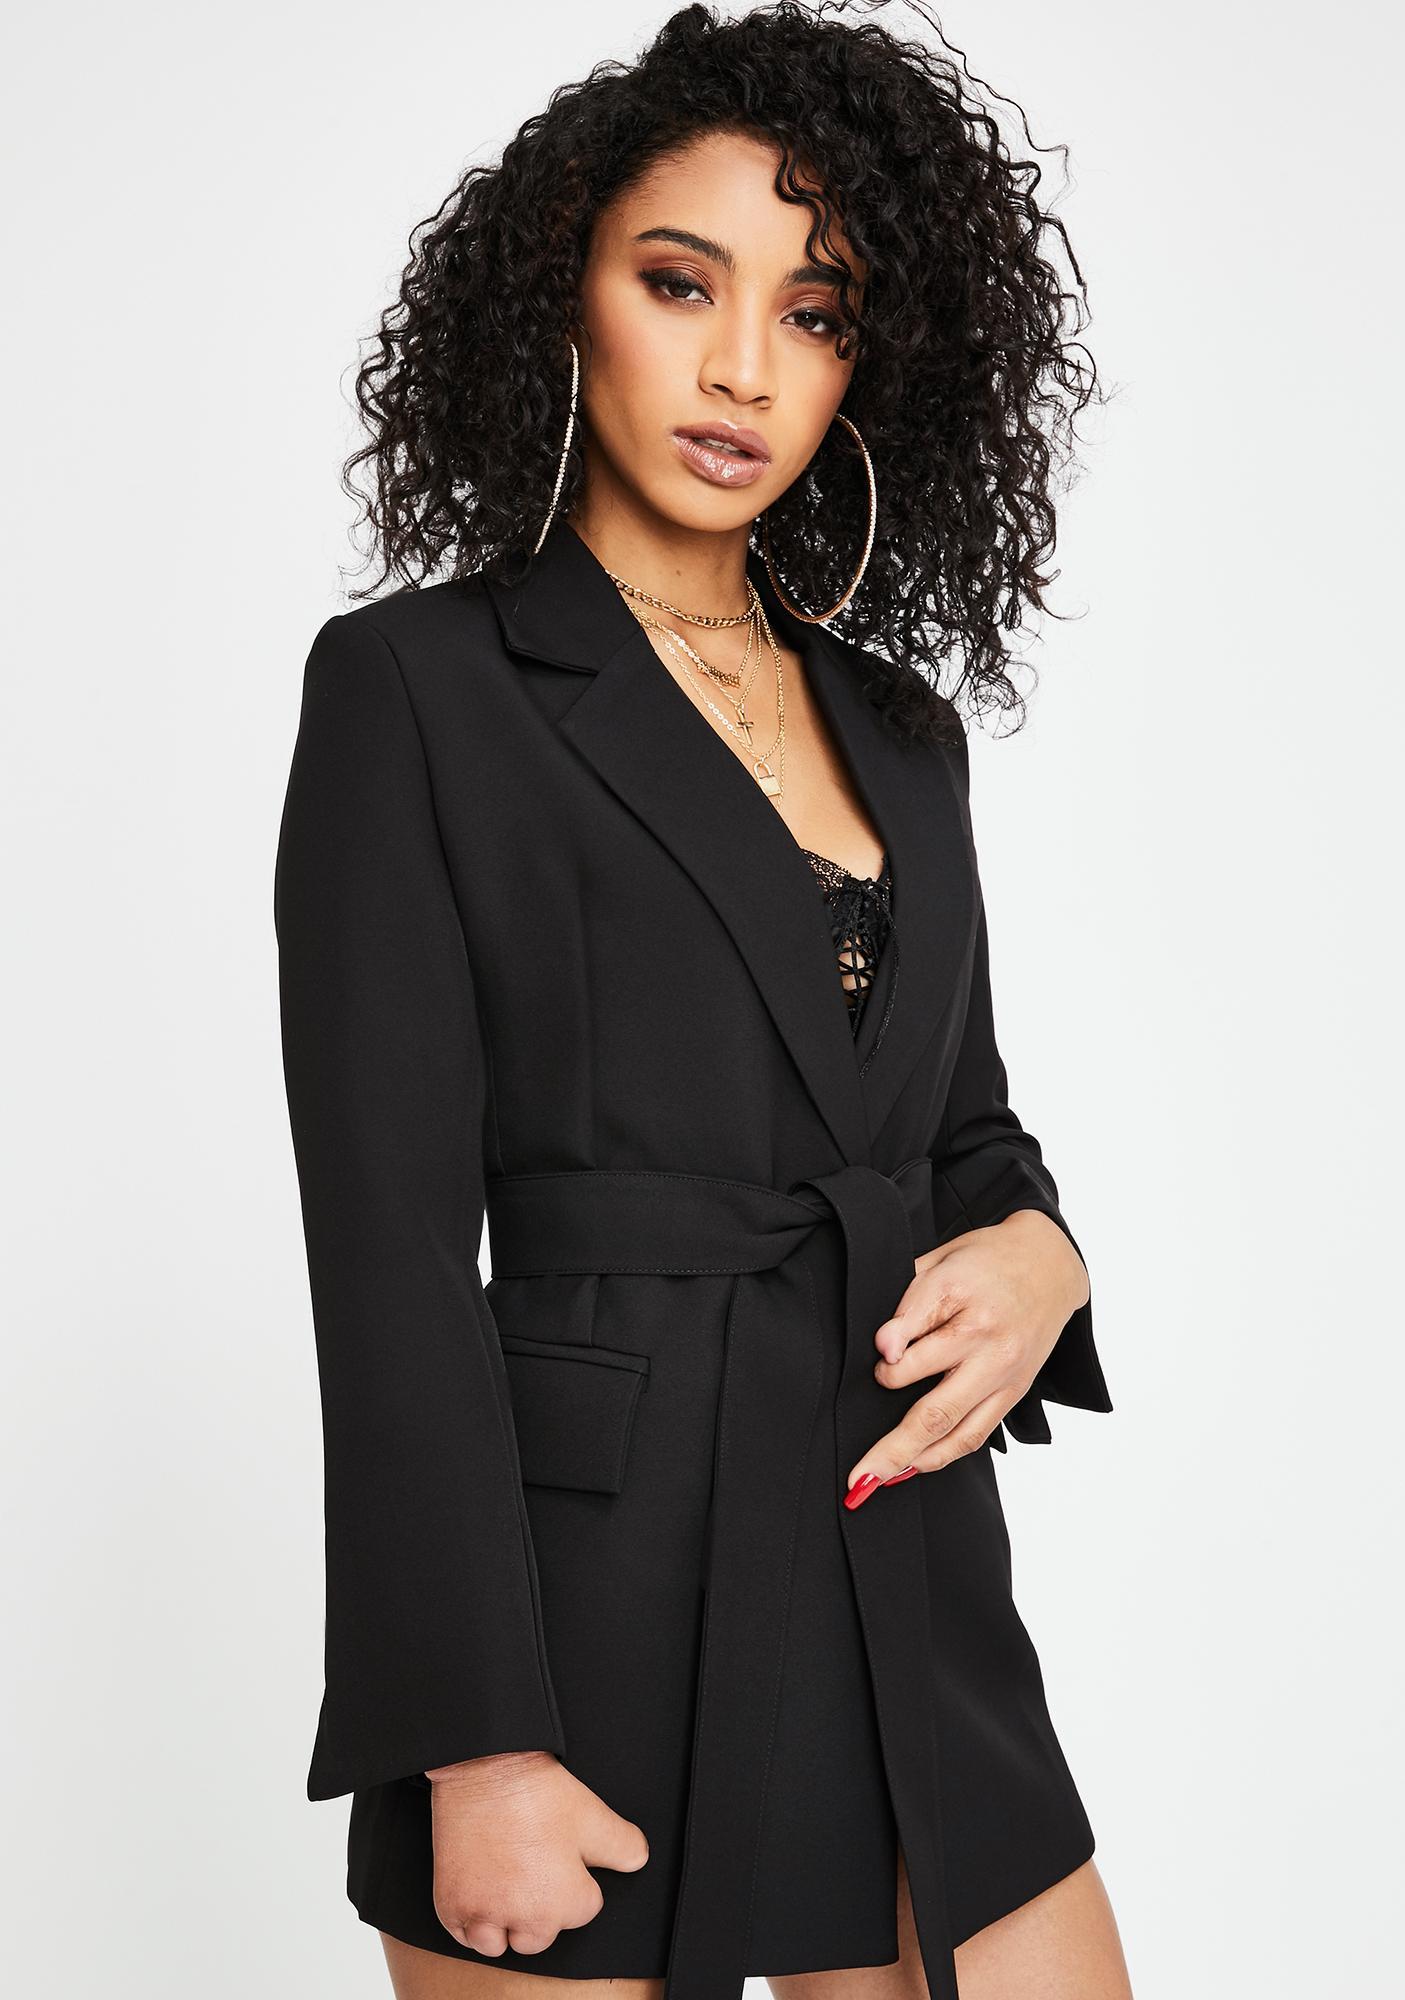 THE KRIPT Leader Blazer Jacket Dress